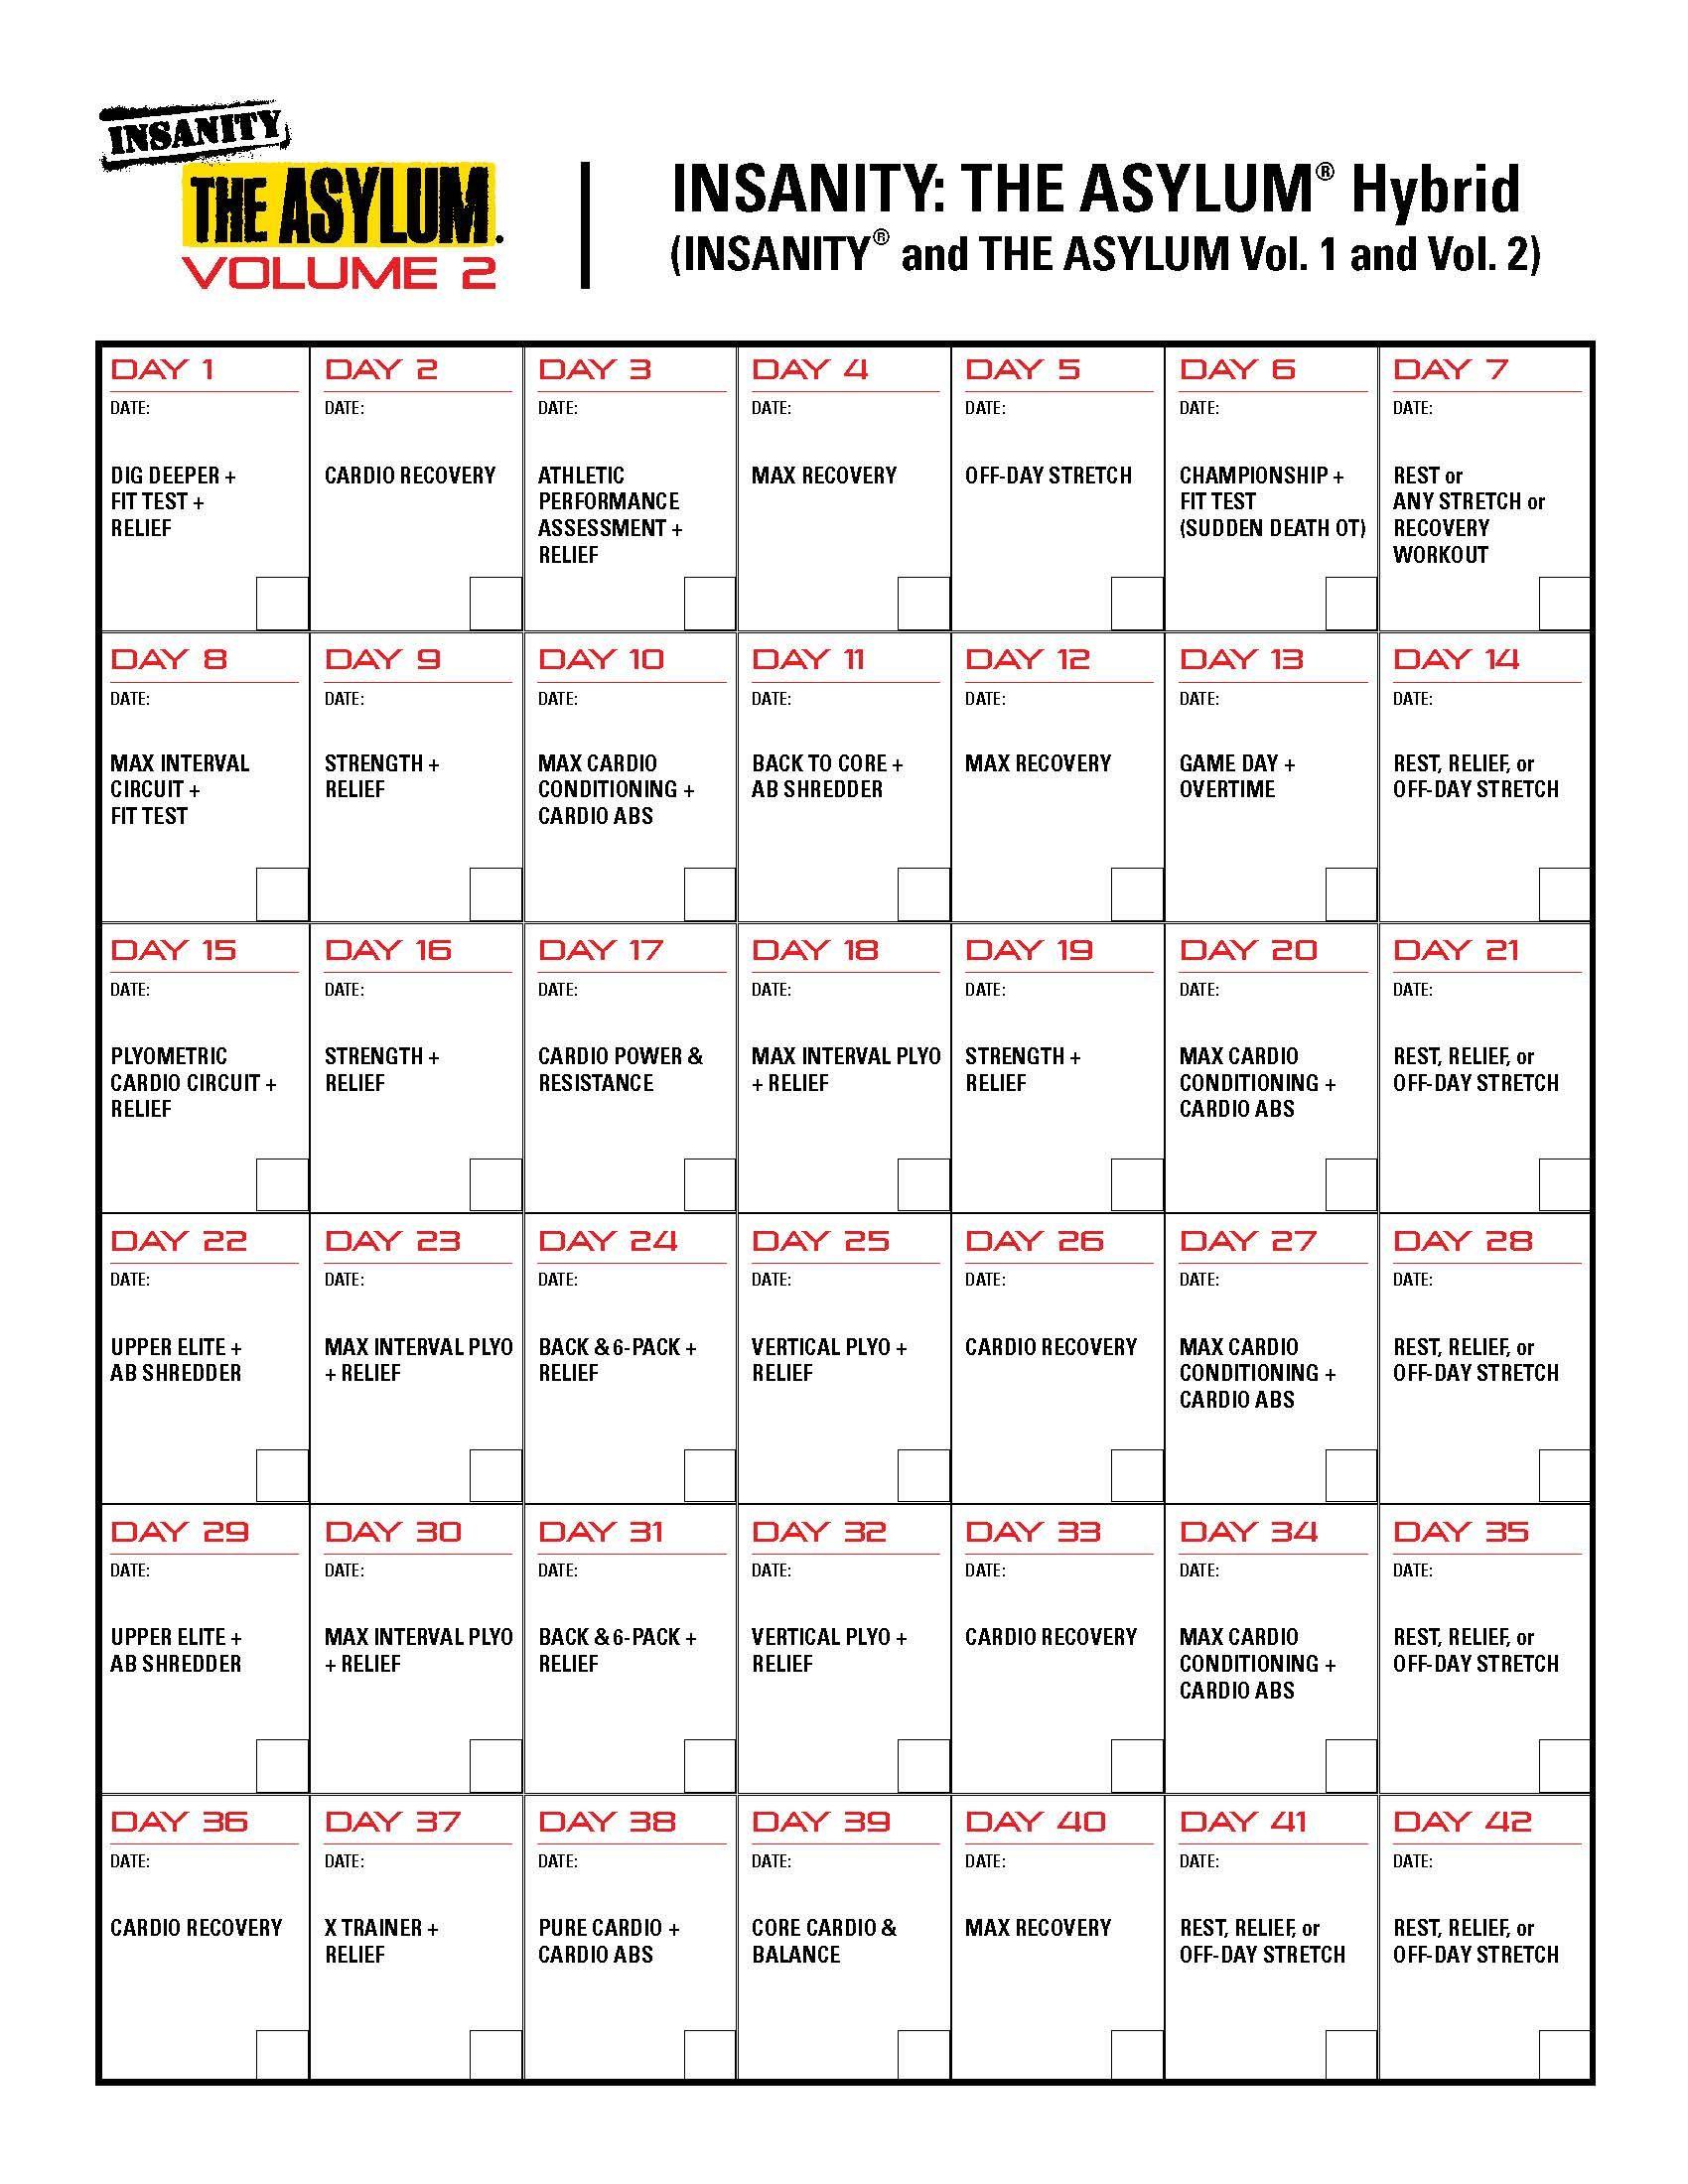 Insanityasylum 1 And 2 Hybrid Month 1  This Is What'S Next regarding Shaun T Hybrid Calendar